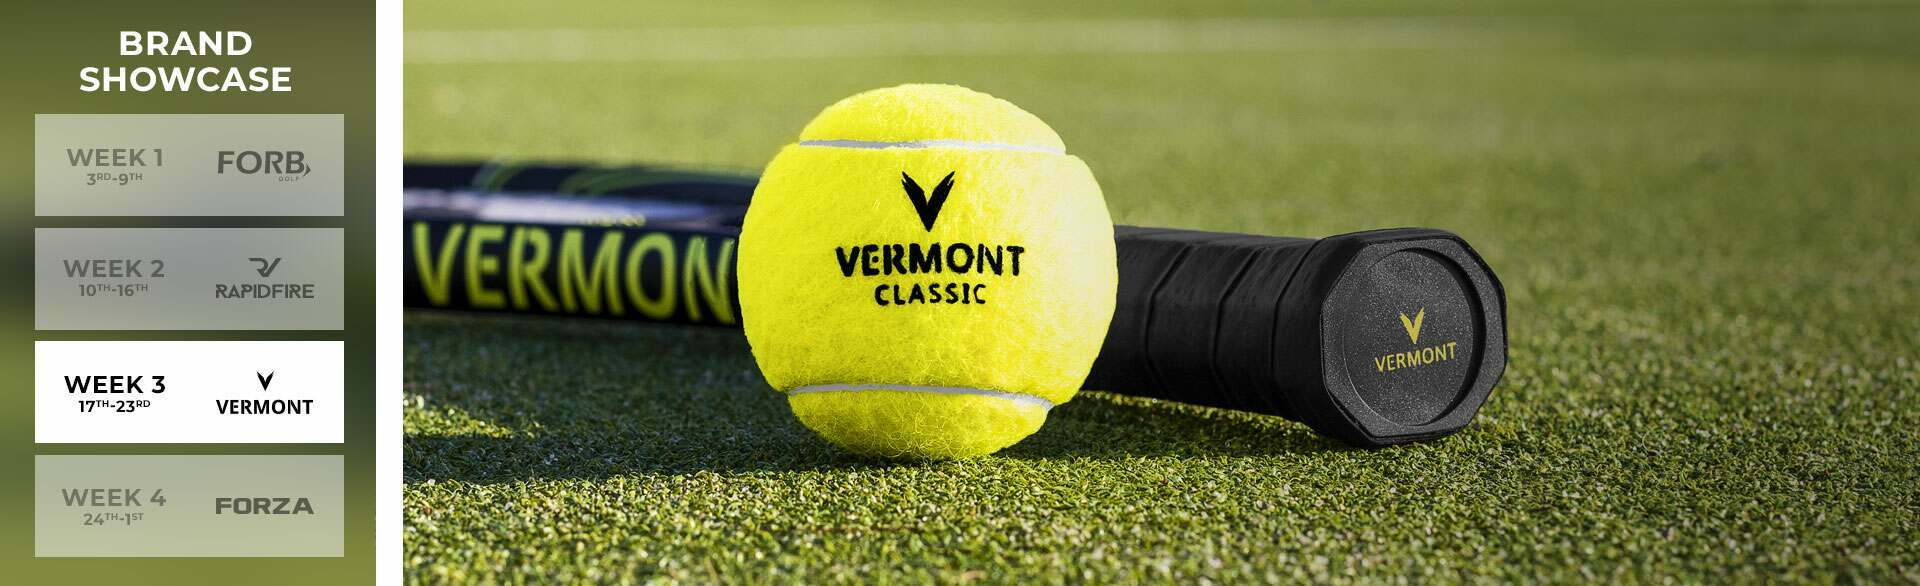 Vermont Tennis Giveaway